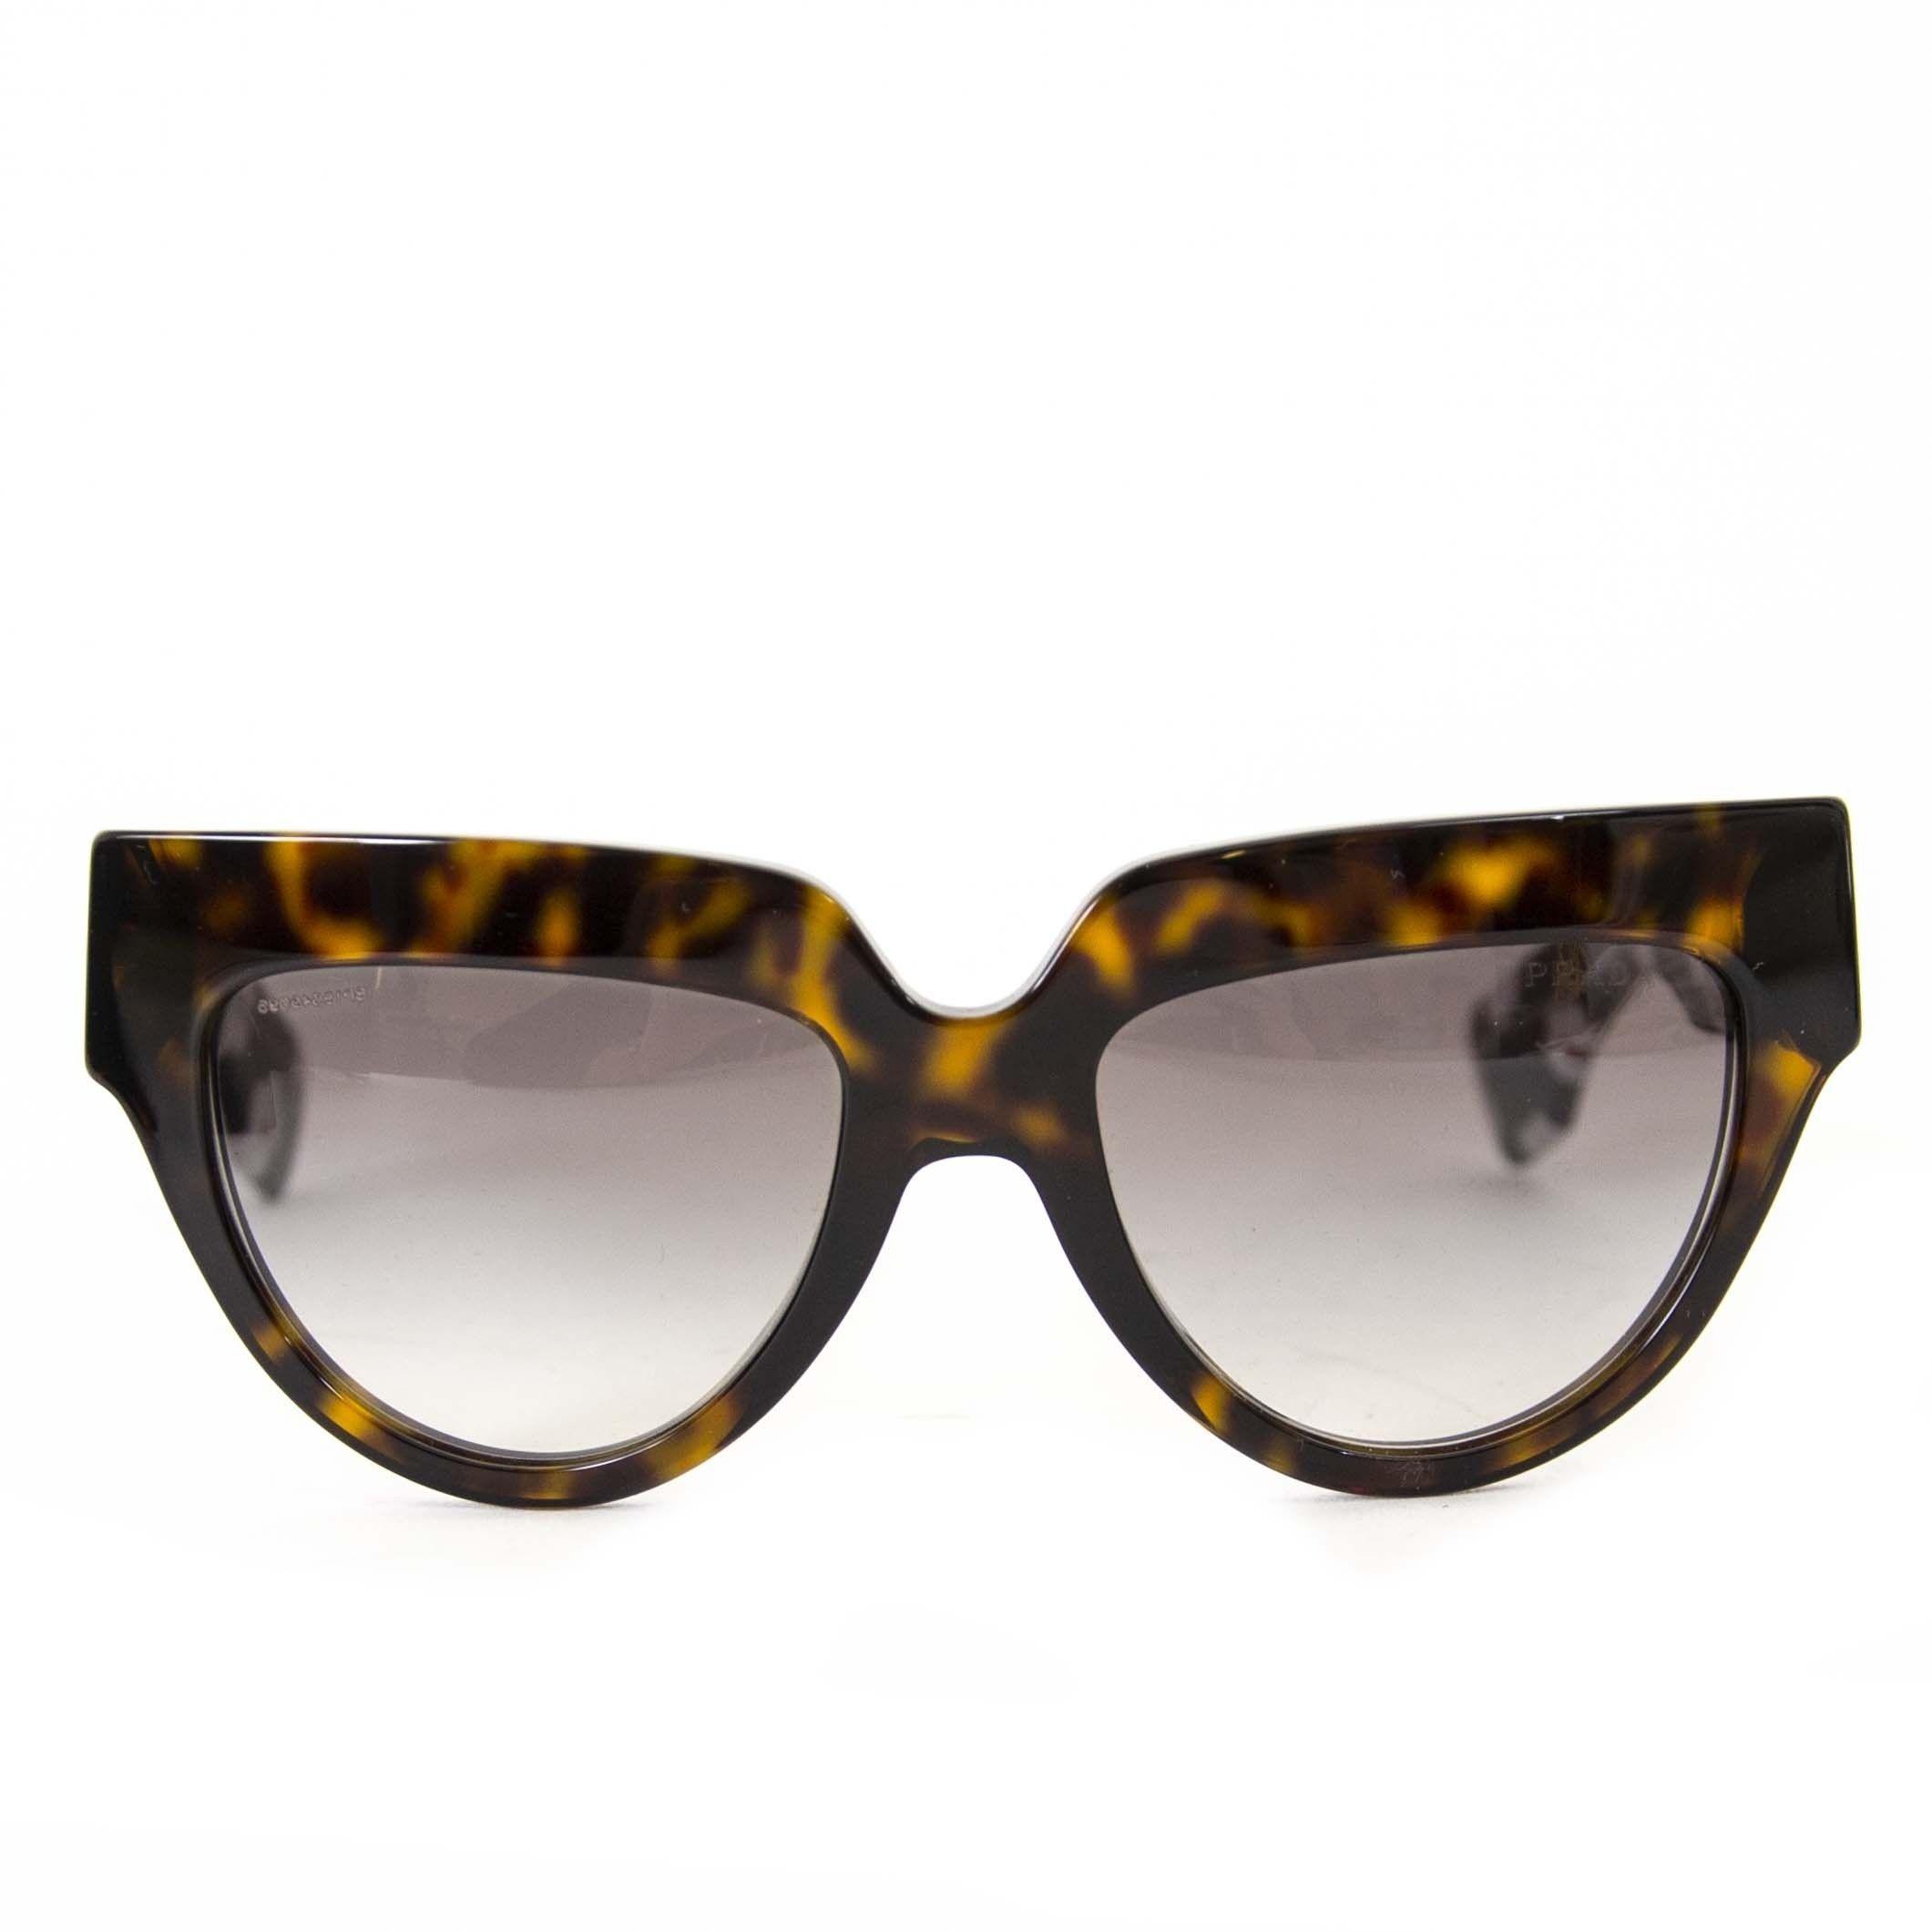 b09d5ba77b2cd Prada Poeme Black And Tortoise Flower Sunglasses